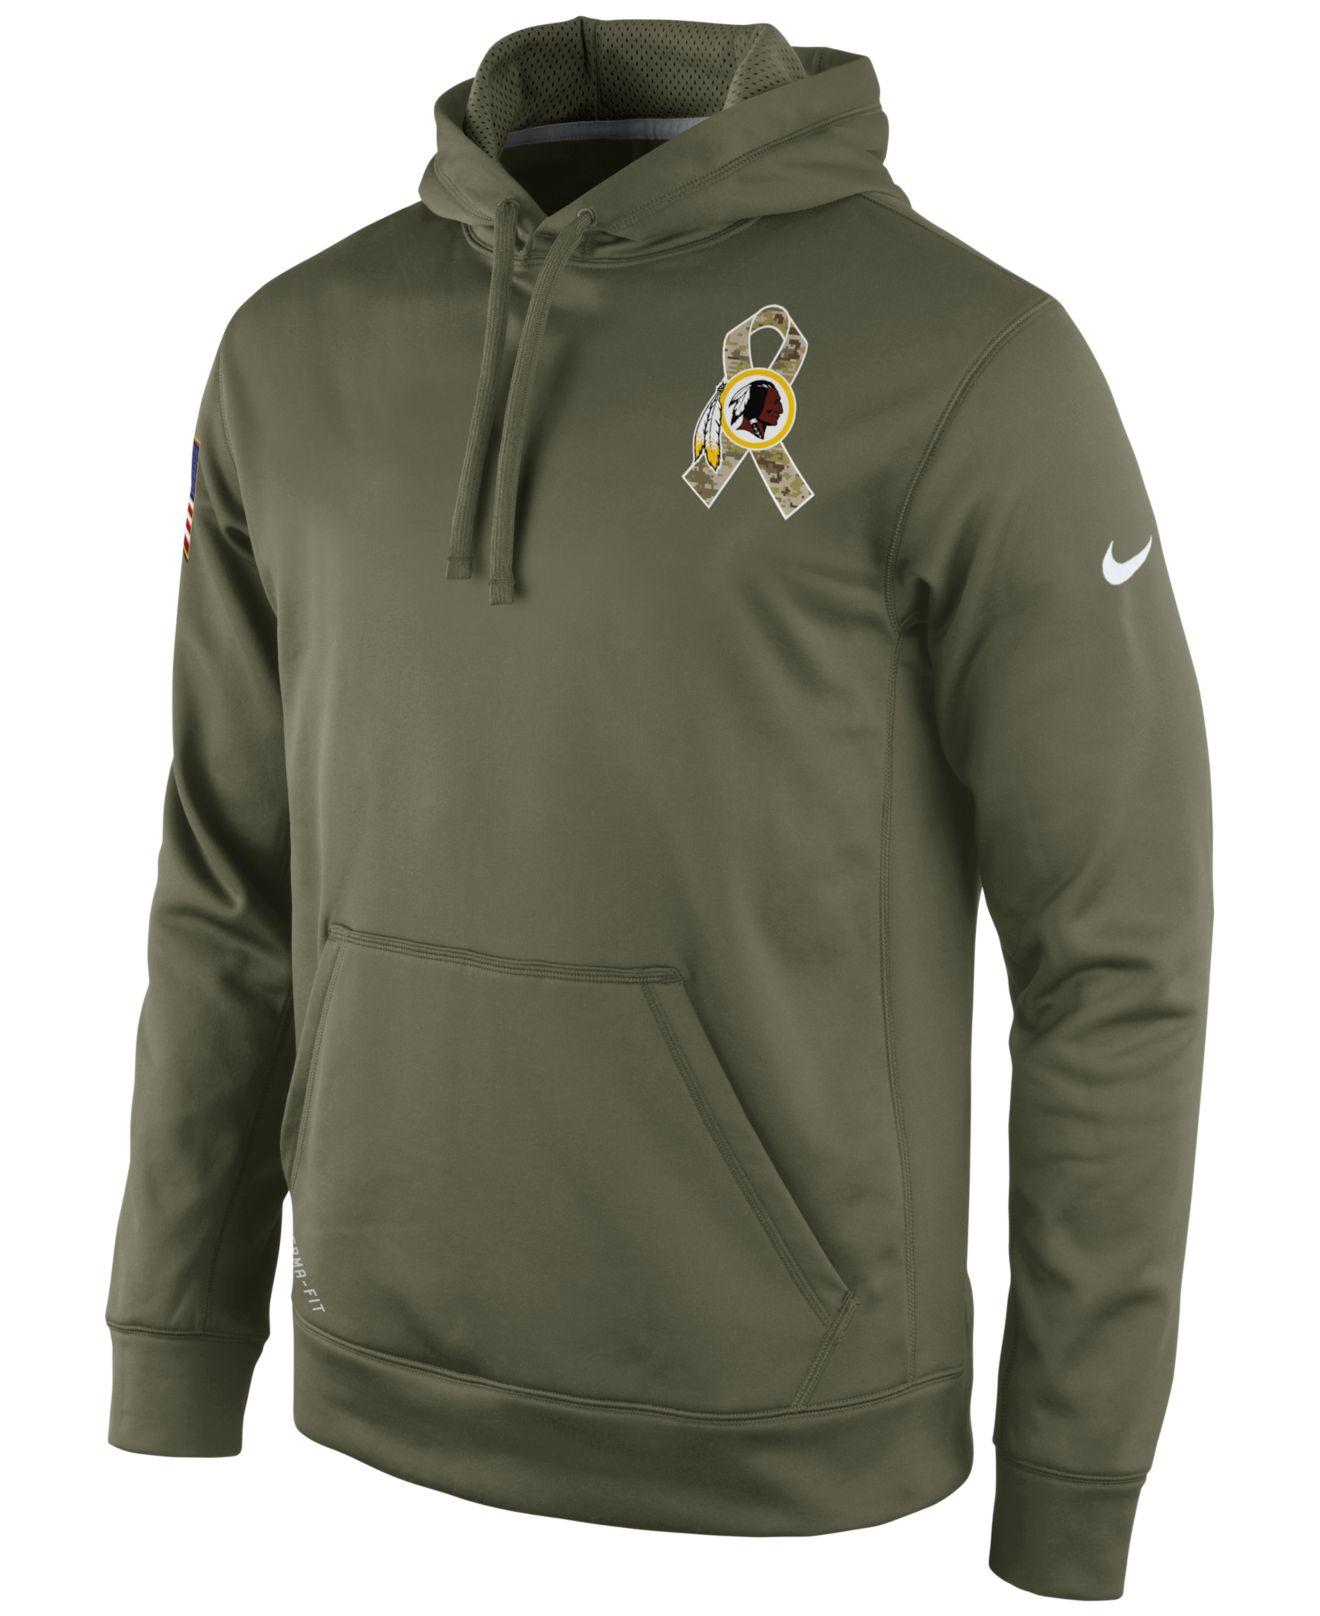 on sale 25cba ce8ed redskins salute the troops hoodie